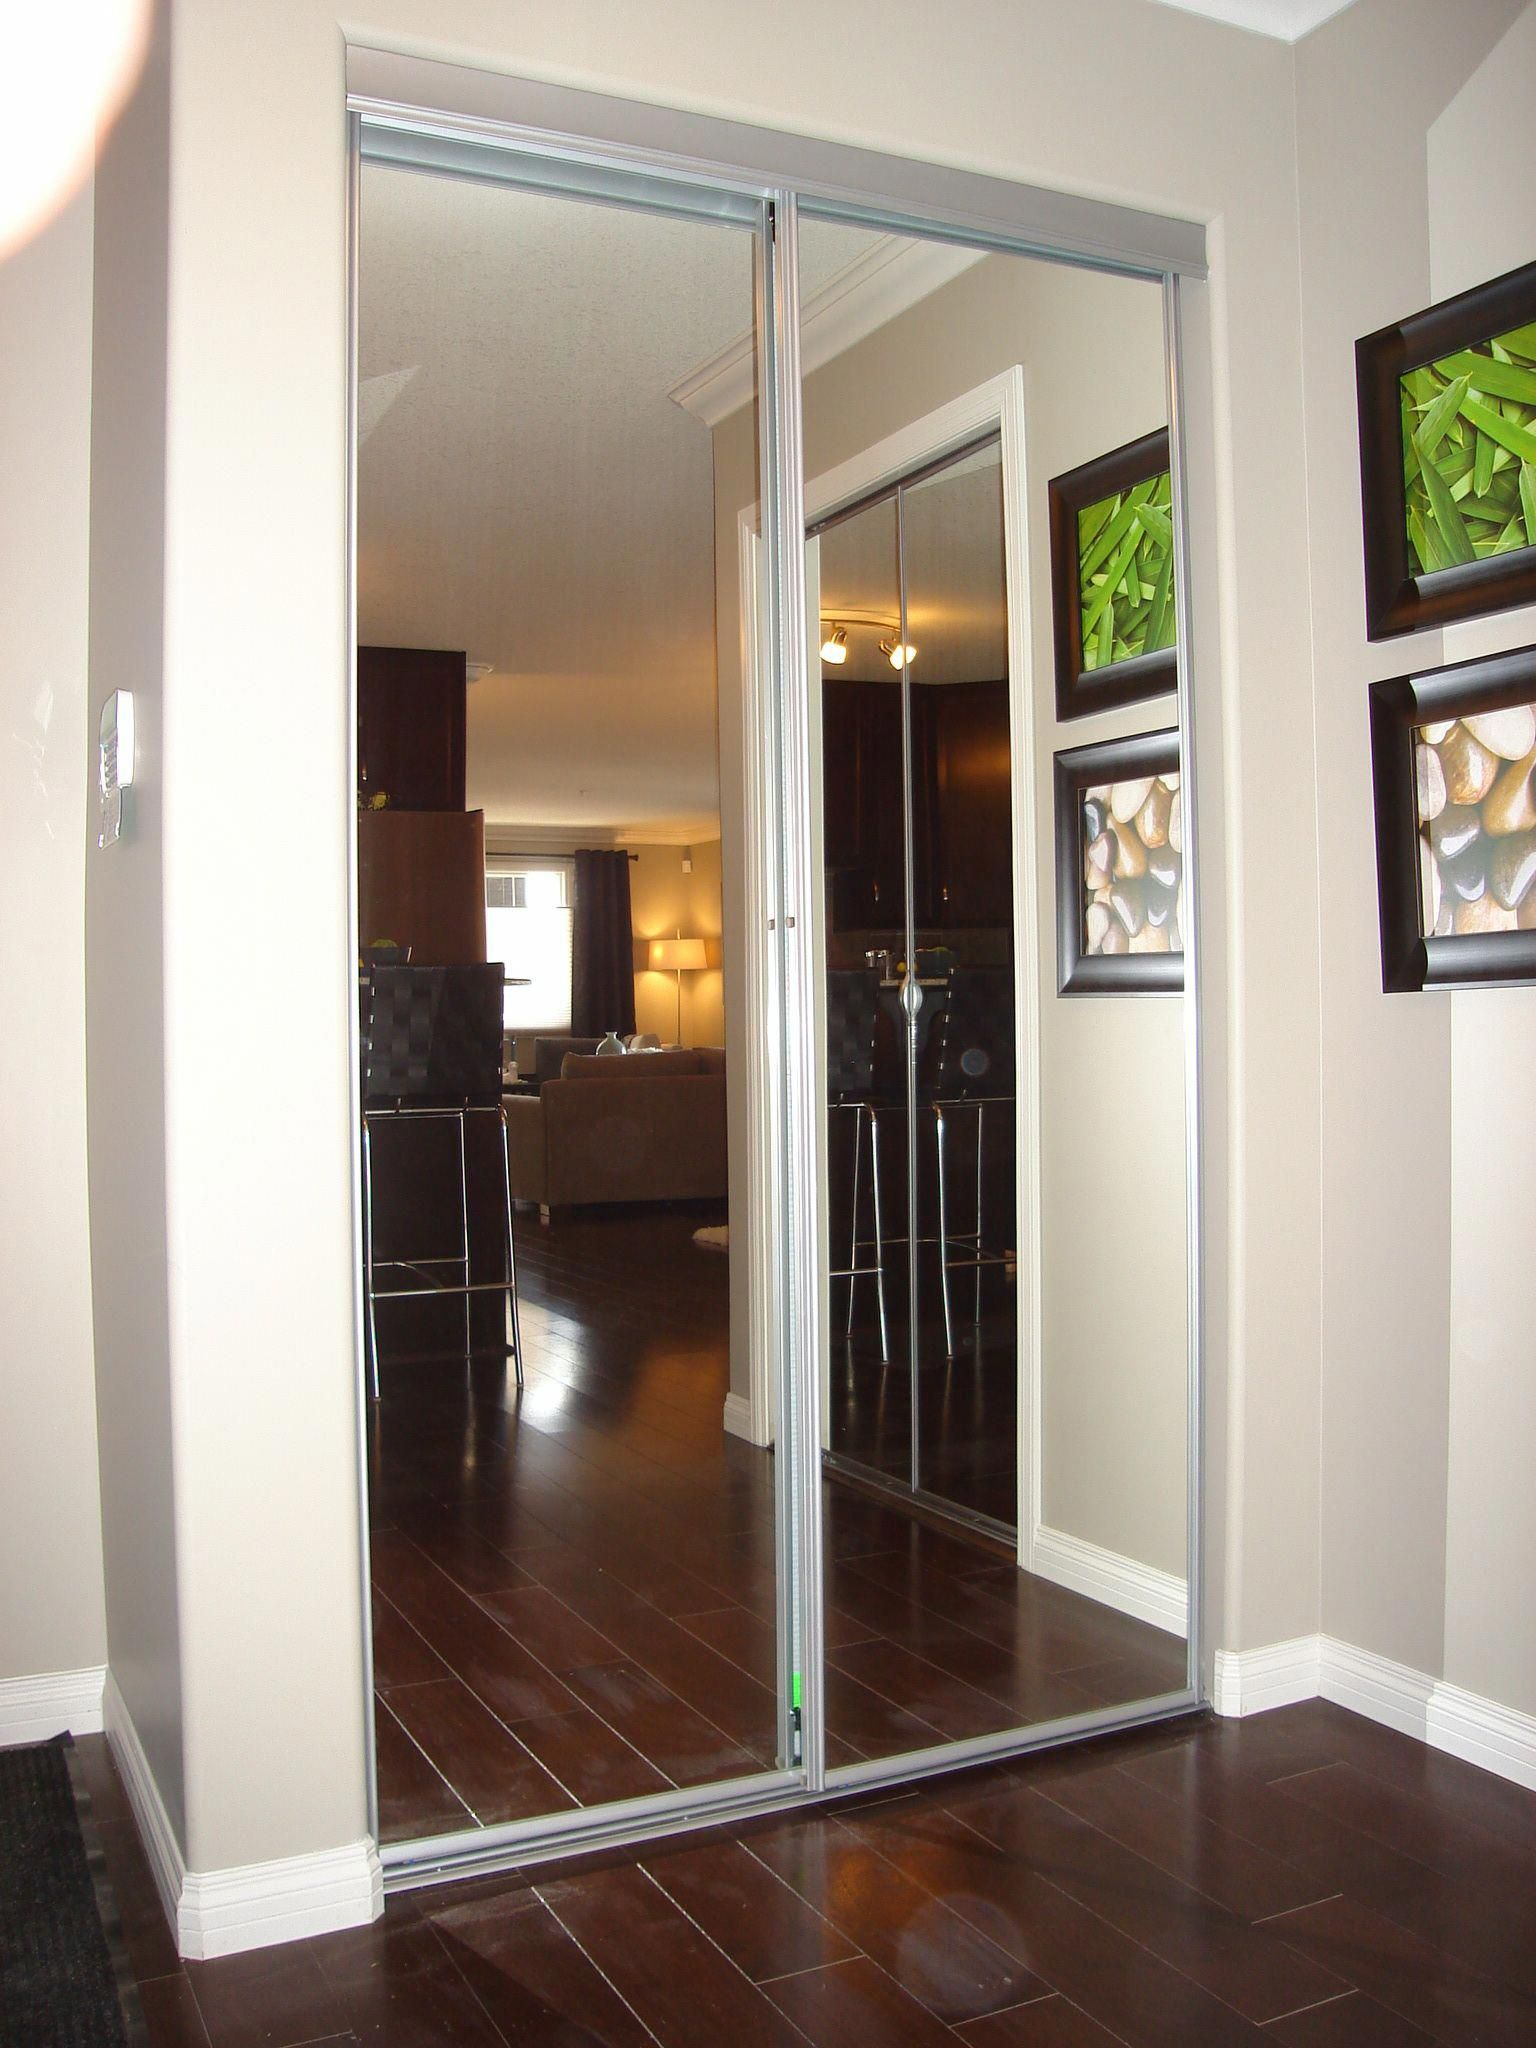 Cheap Home Decorating Websites Homedecorationsforsale Interior French Doors Menards In 2019 Mirror Closet Doors Sliding Wardrobe Doors Glass Closet Doors